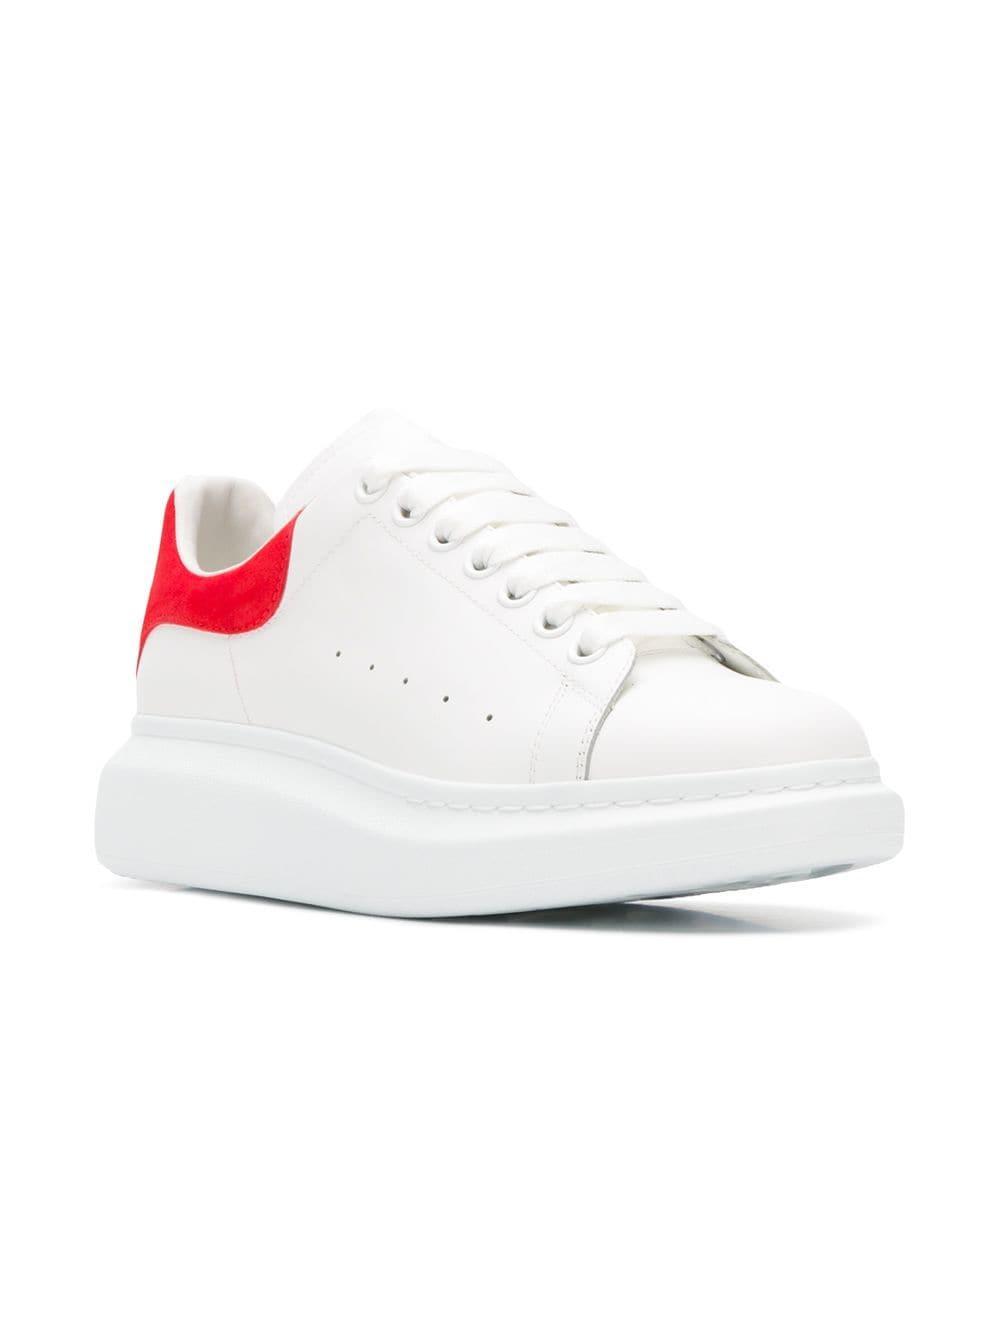 d4627610d12a Lyst - Alexander McQueen Heel Tab Wedge Sole Sneaker in White for Men -  Save 45%